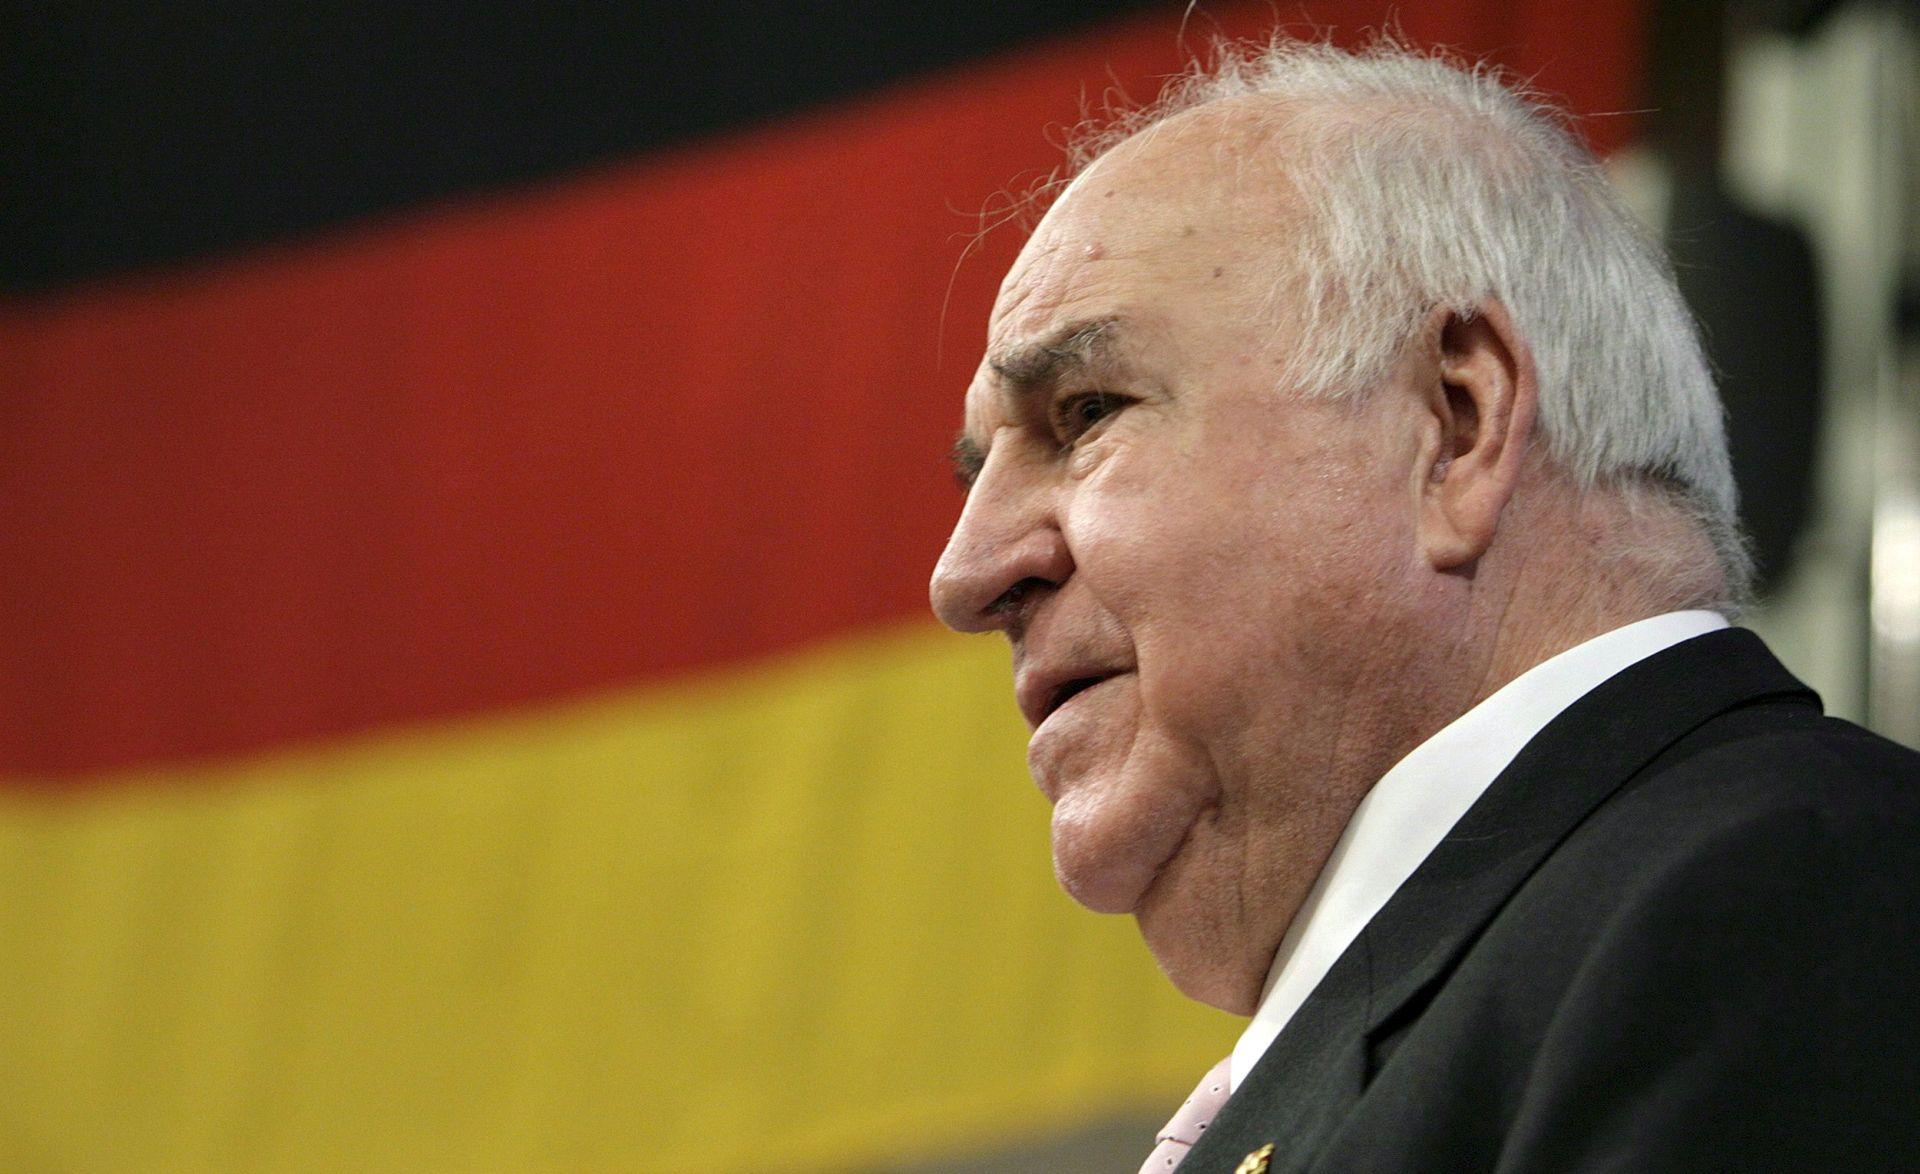 Preminuo Helmut Kohl, arhitekt ujedinjenja Njemačke